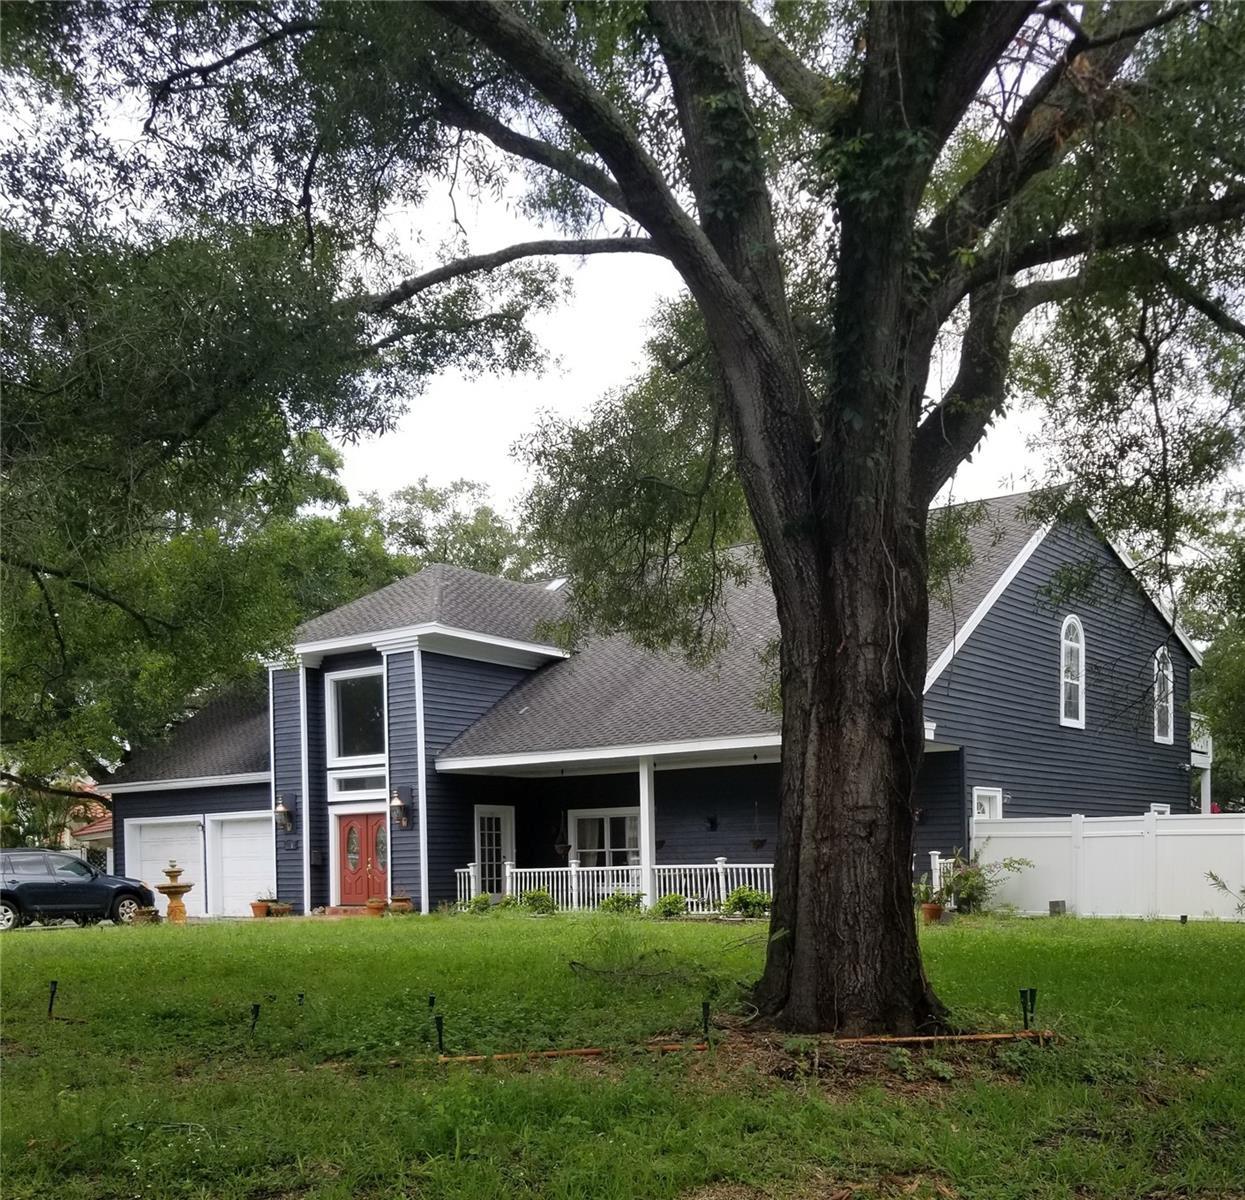 4201 W. Beachway Dr., Tampa, FL, 33609 United States